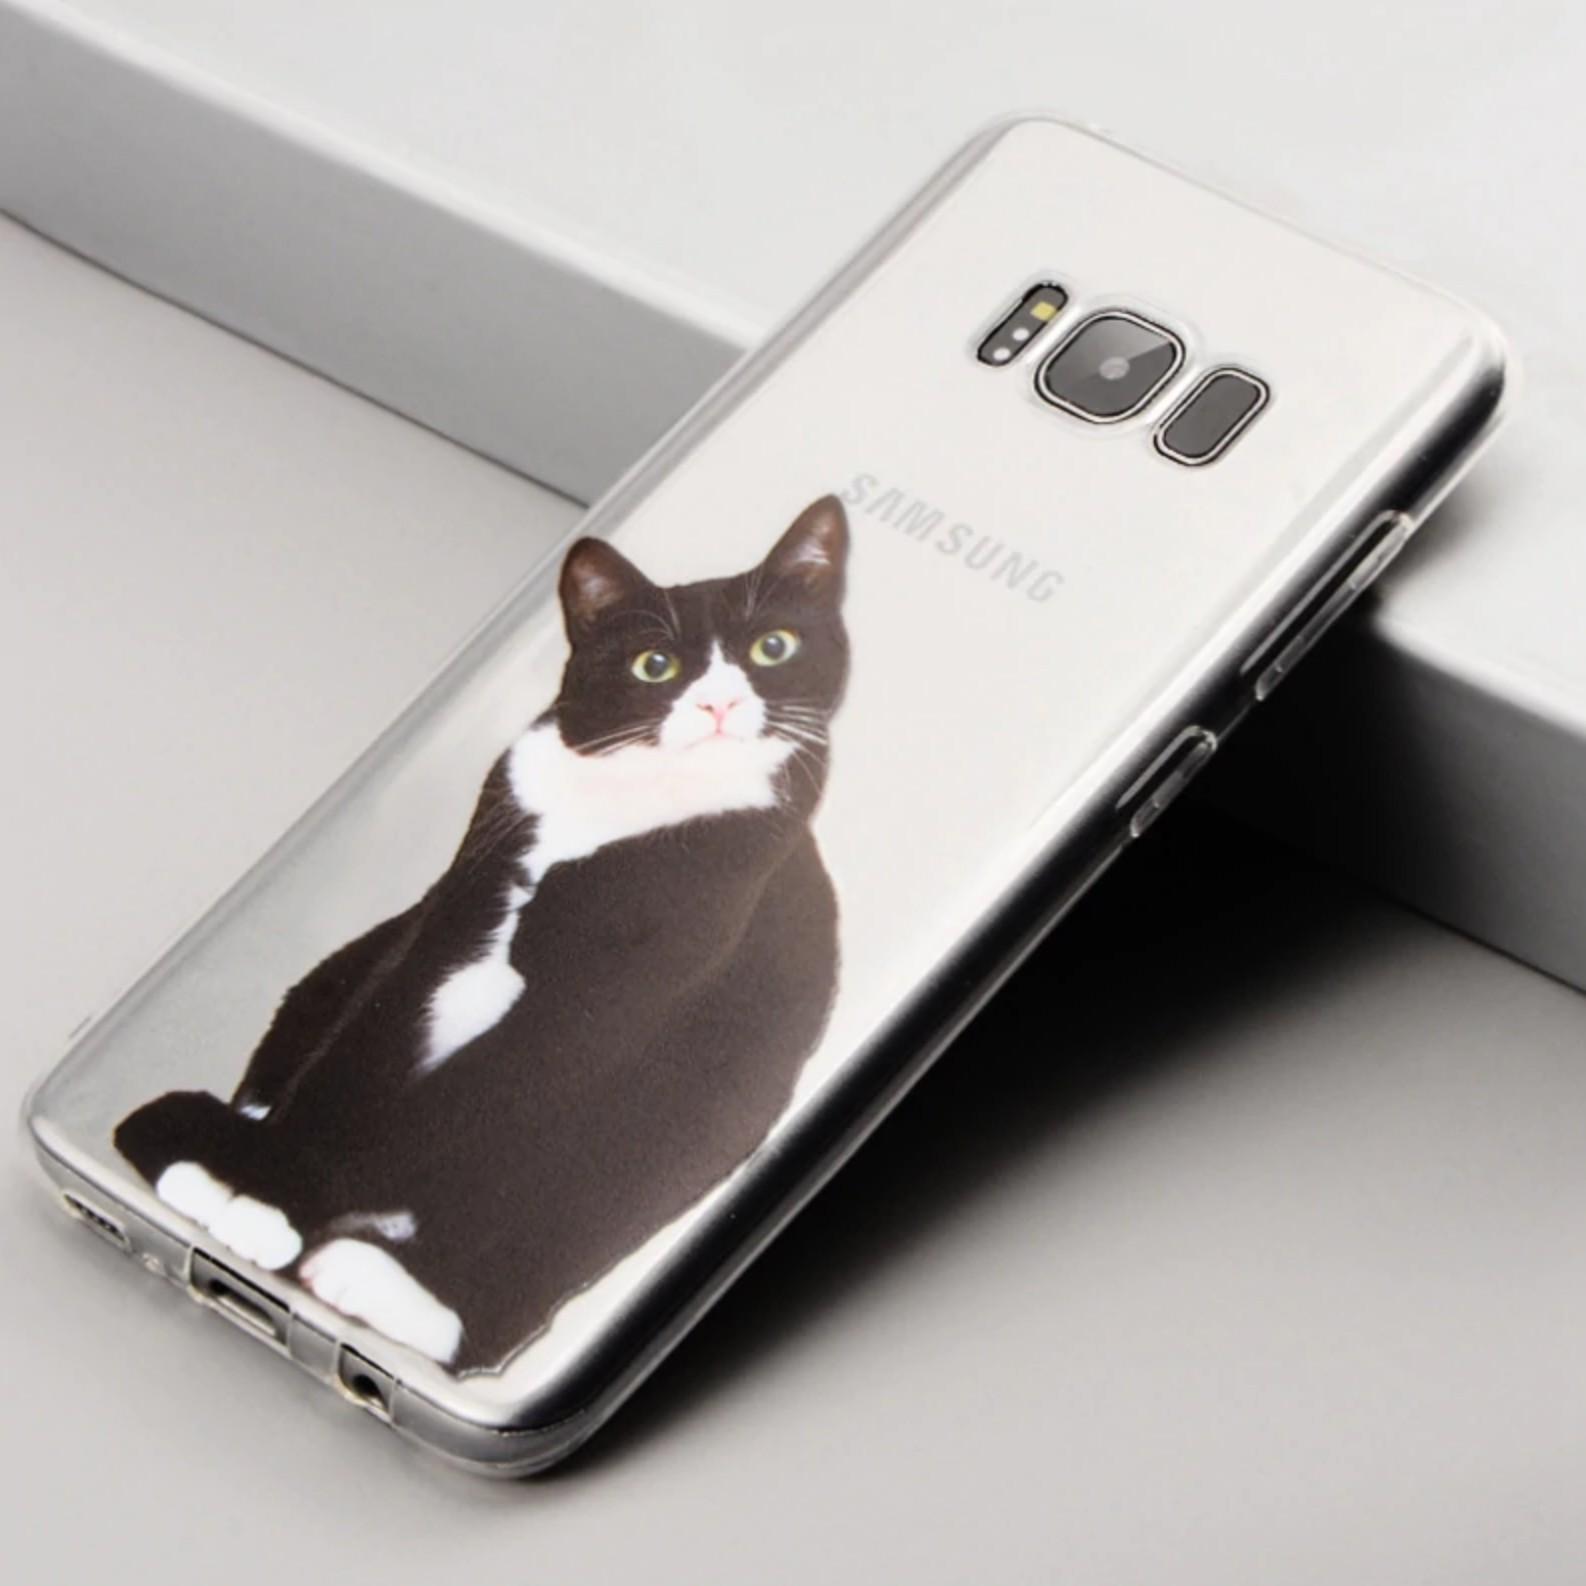 Coque silicone transparente chat noir et blanc Samsung A5 2017